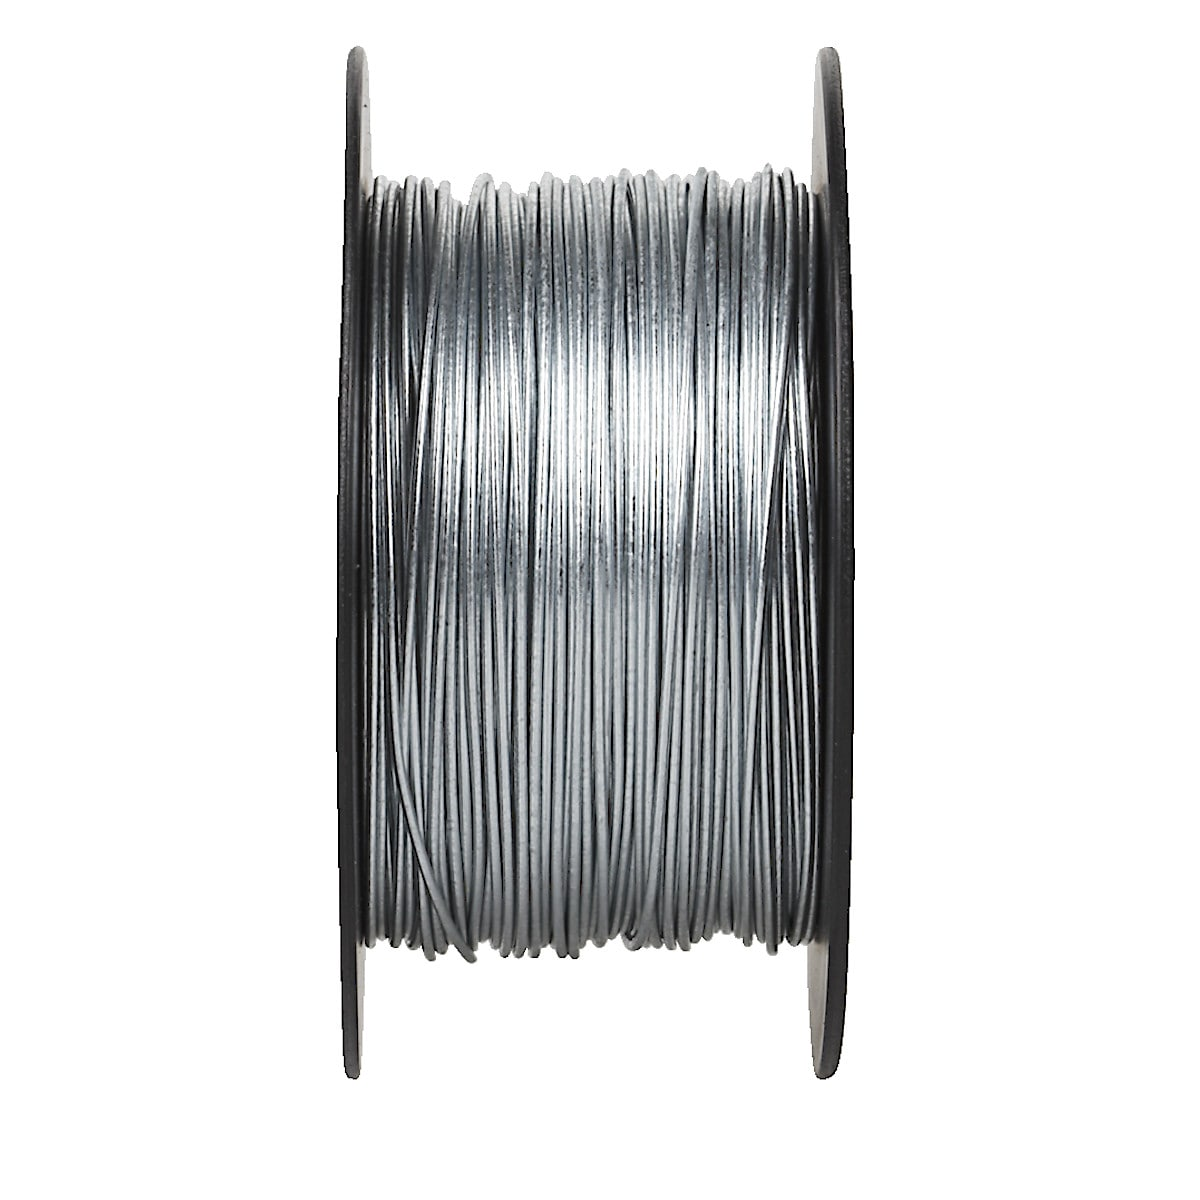 Järntråd 10 mm